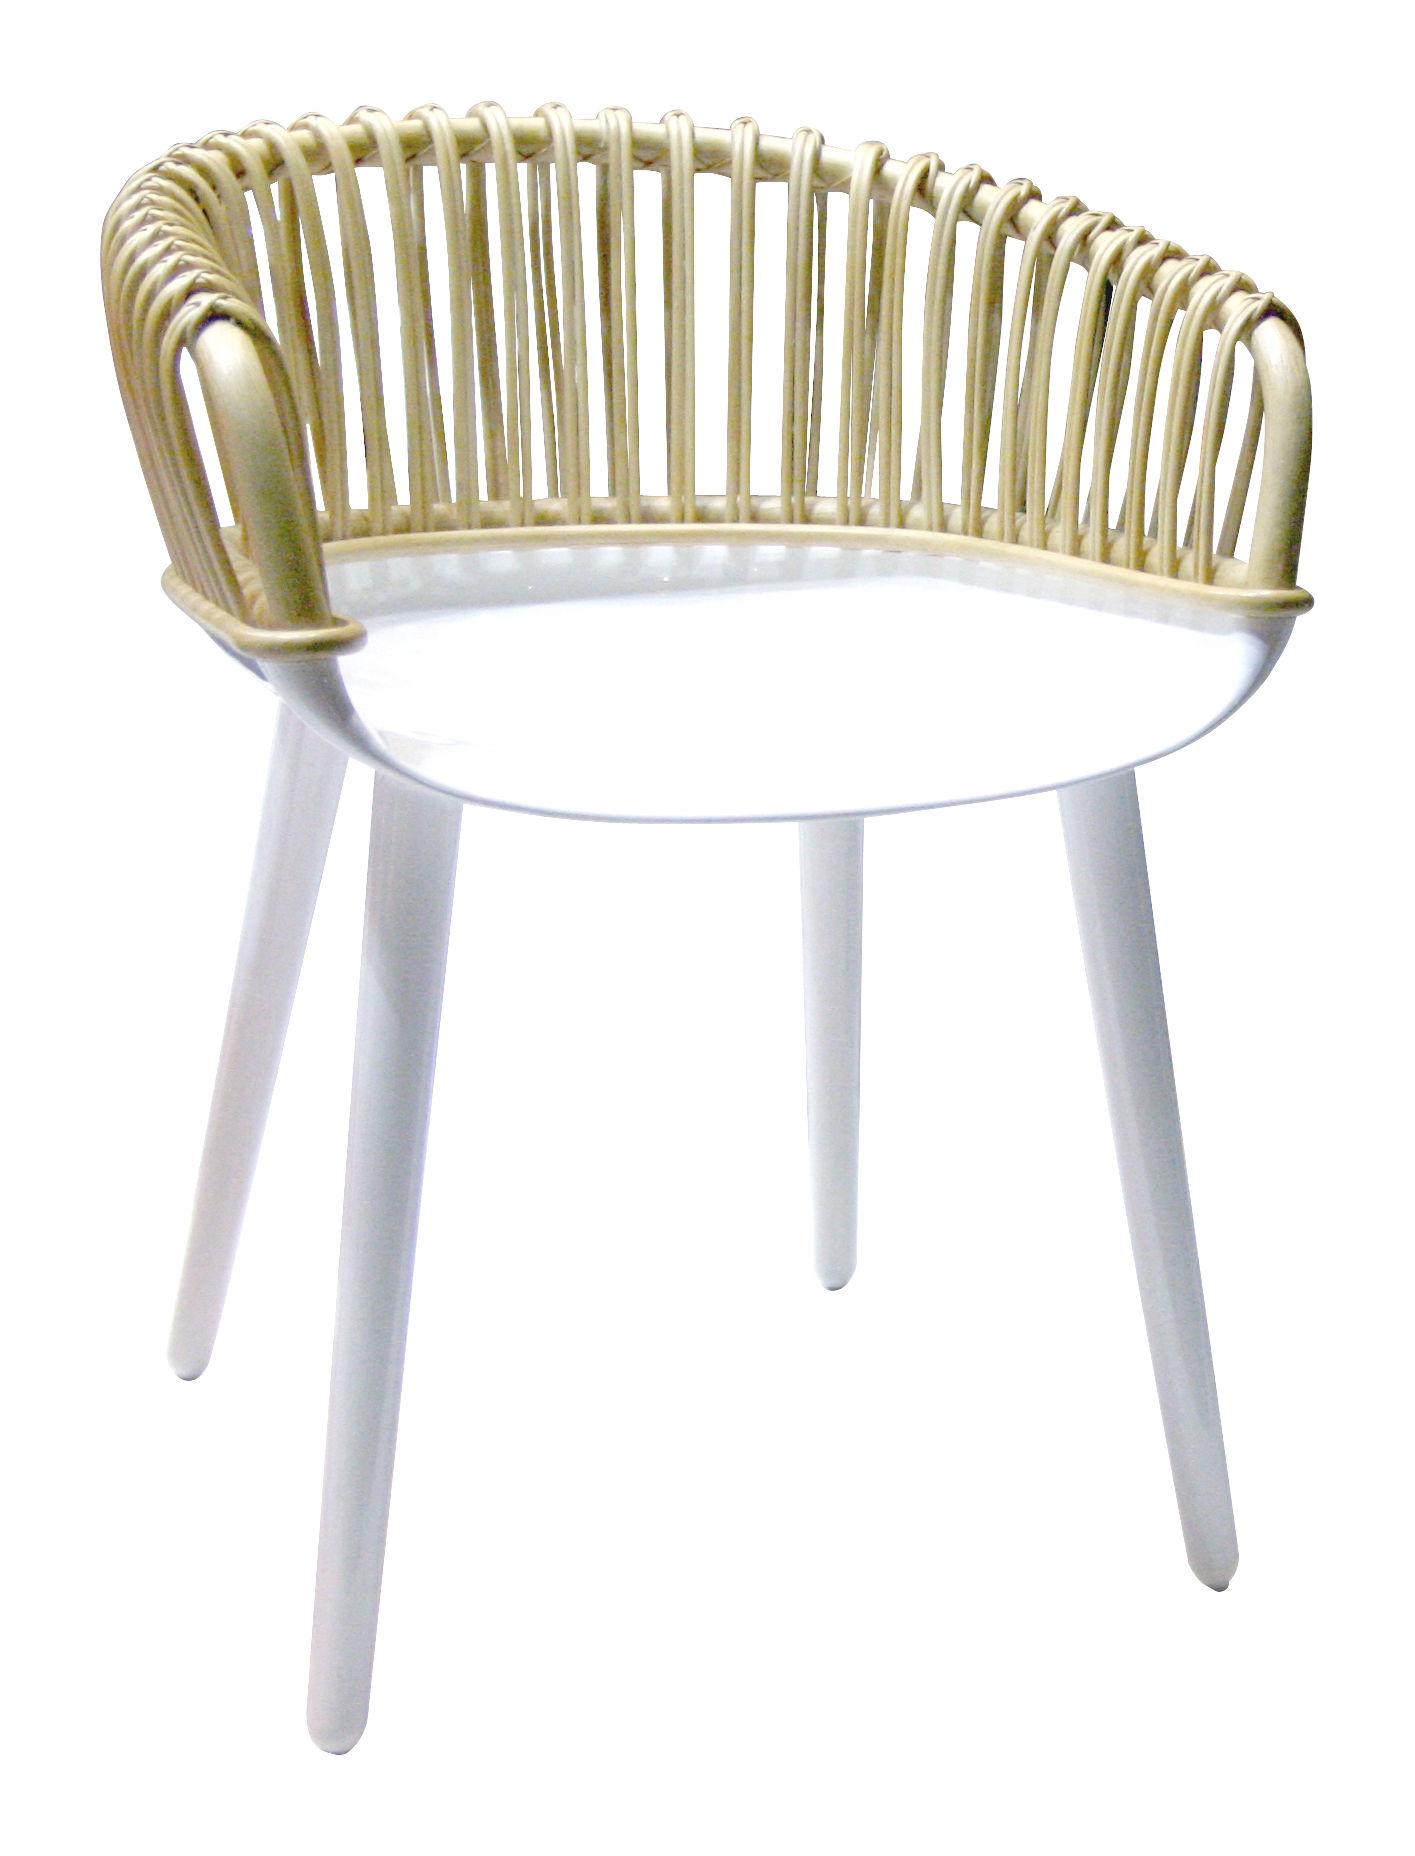 fauteuil cyborg polycarbonate dossier osier dossier osier naturel pi tement et assise. Black Bedroom Furniture Sets. Home Design Ideas